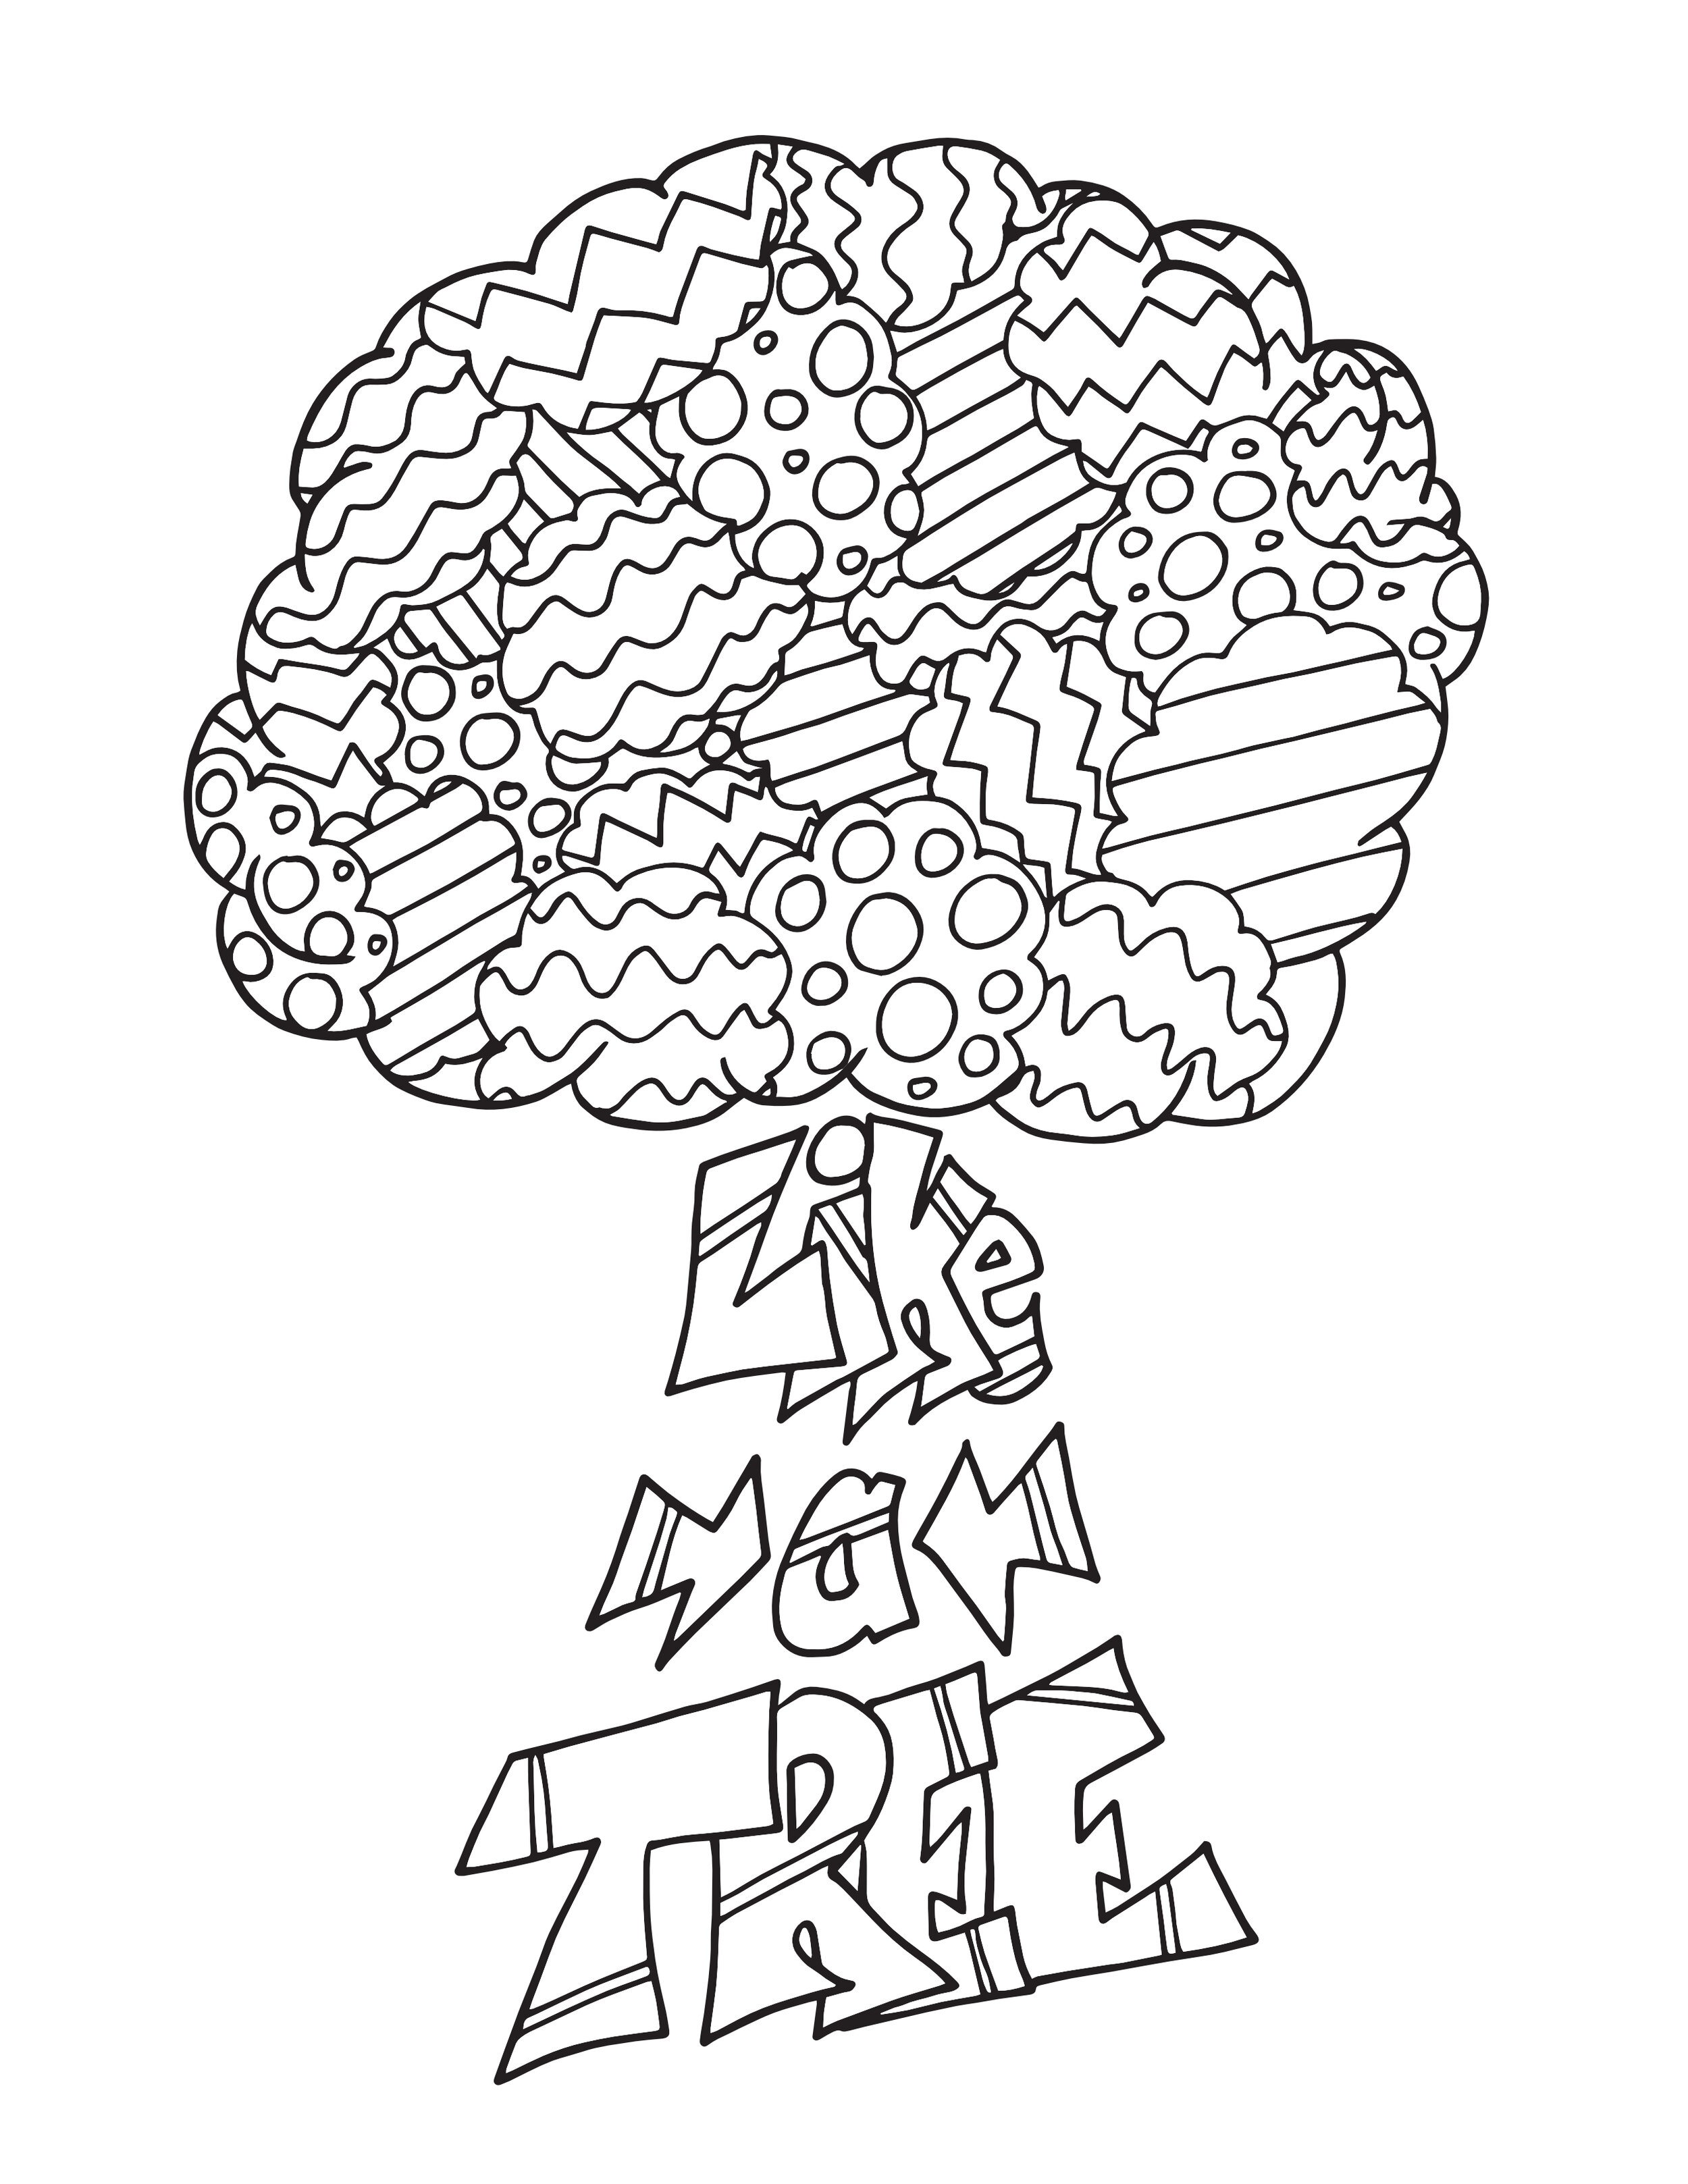 Like A Tree Stevie Doodles.jpg